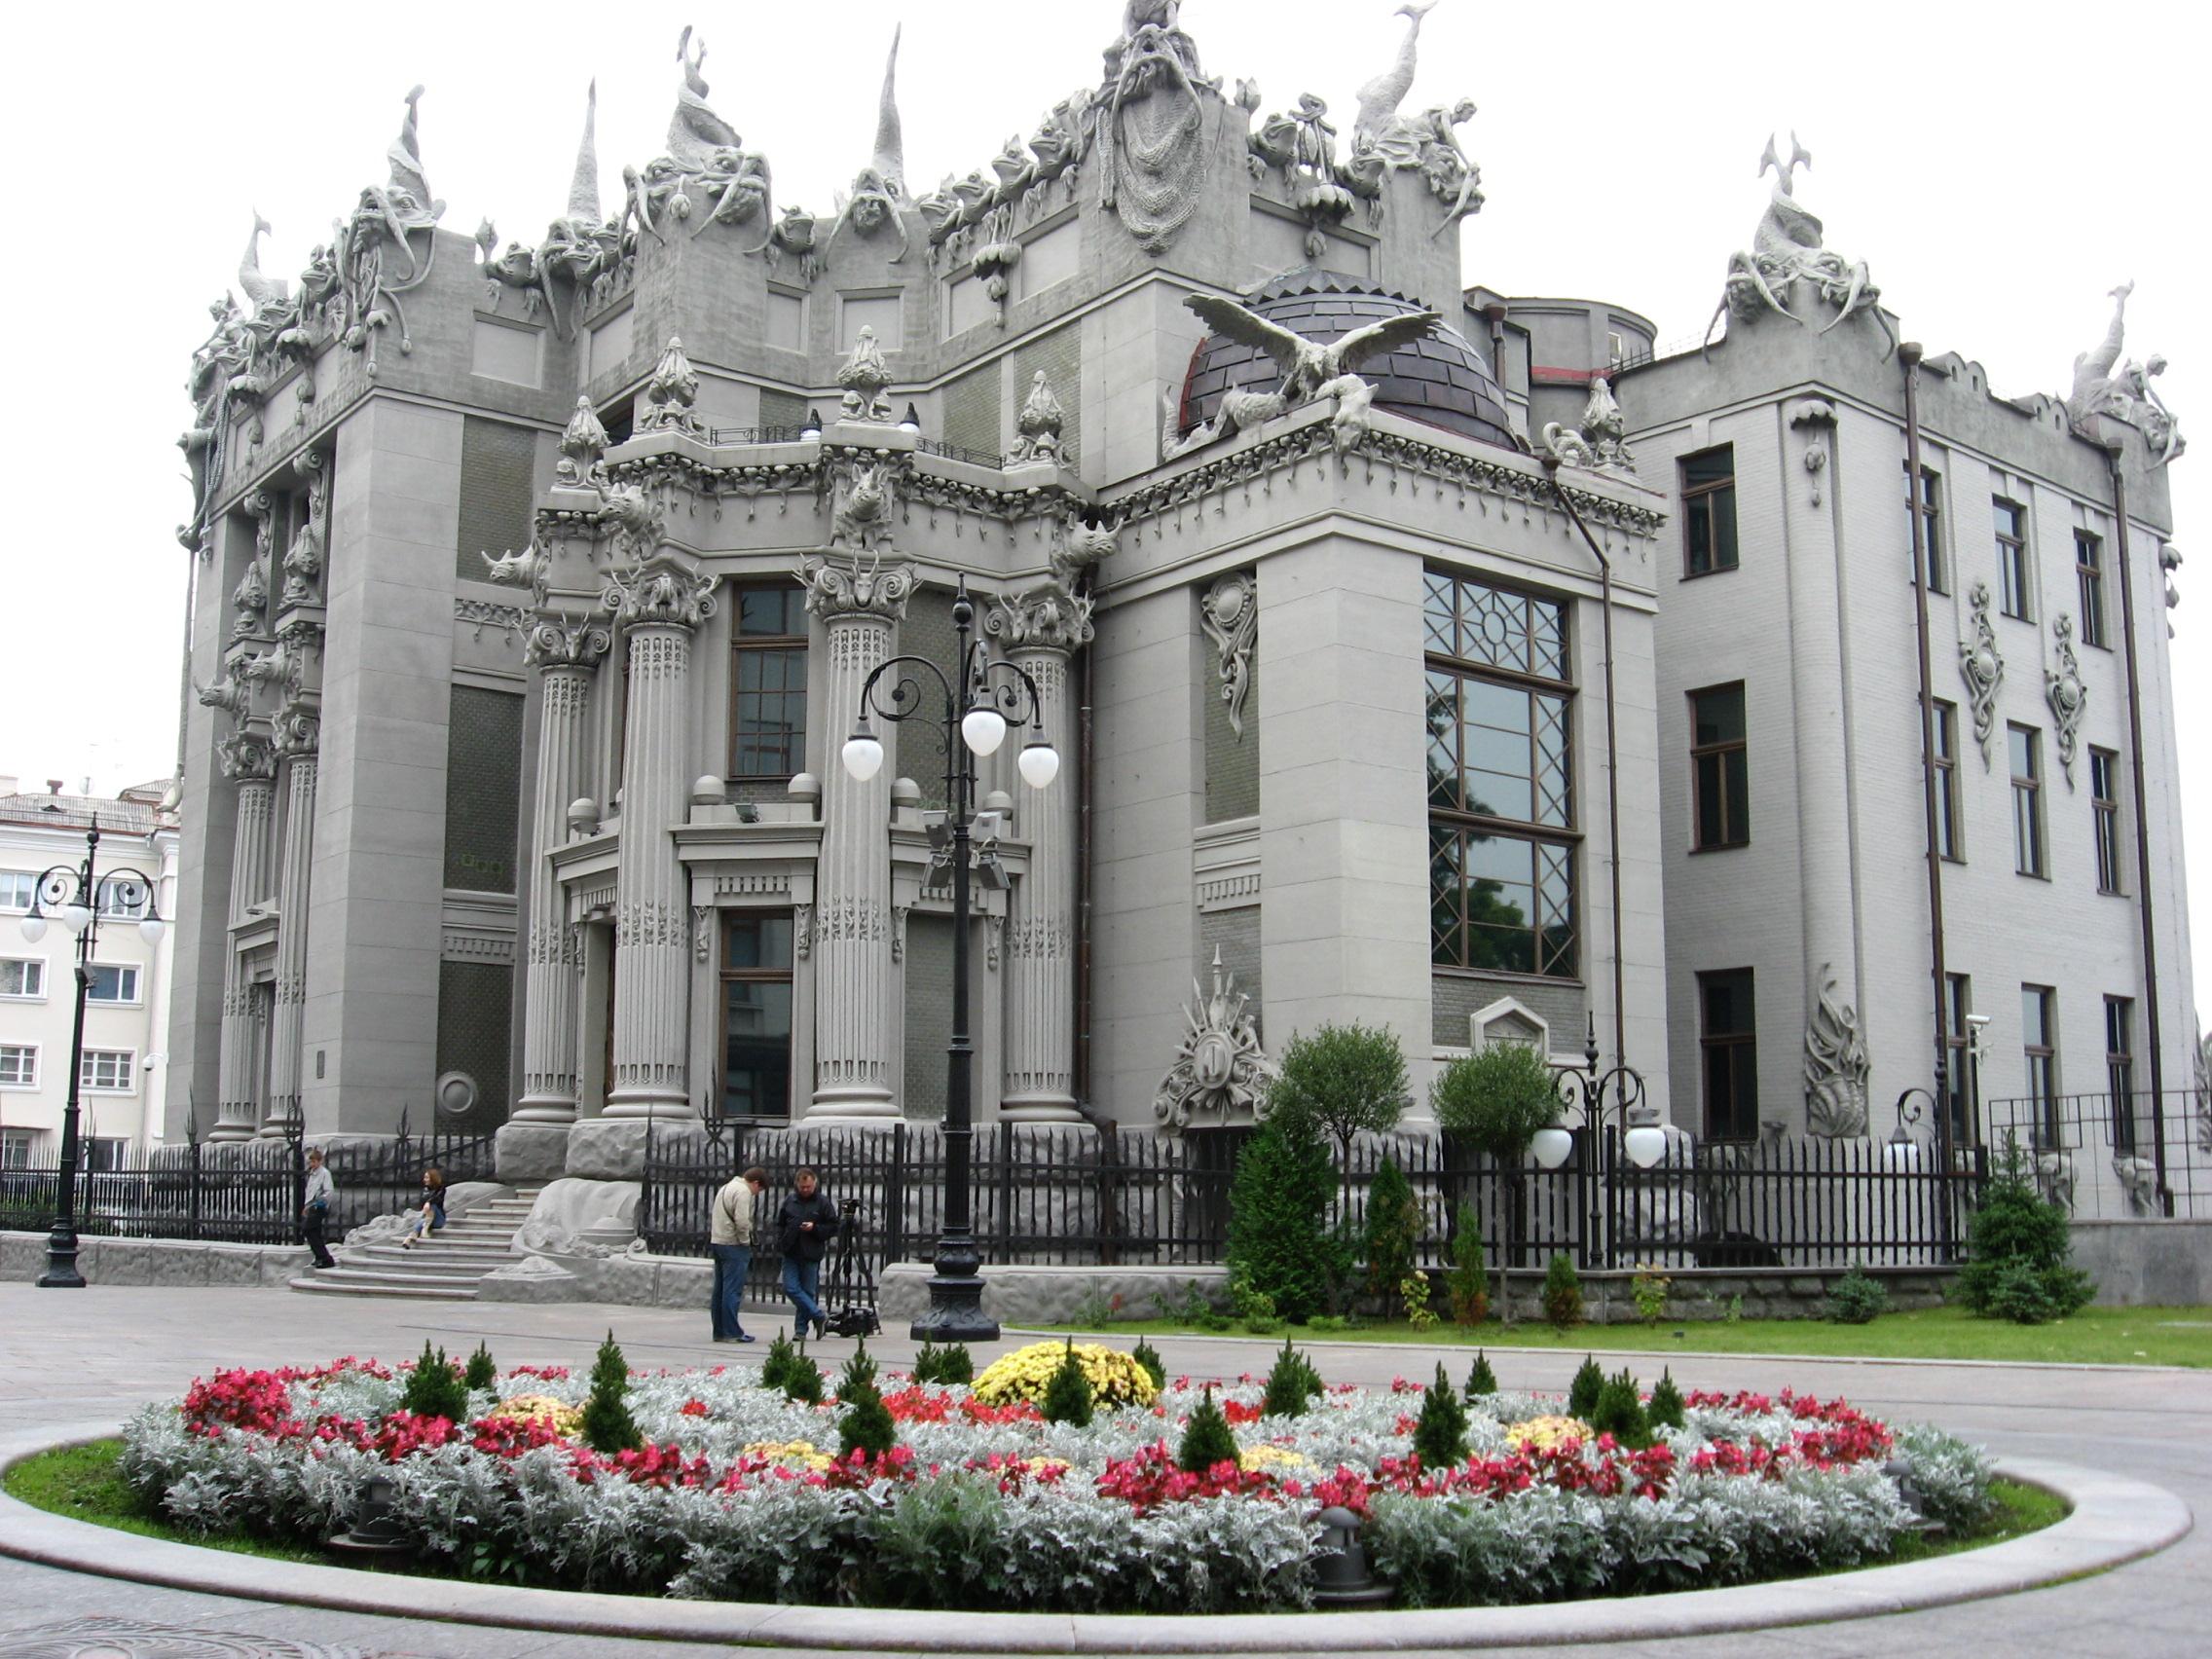 https://upload.wikimedia.org/wikipedia/commons/4/43/Kyiv_-_Bankova_10.jpg